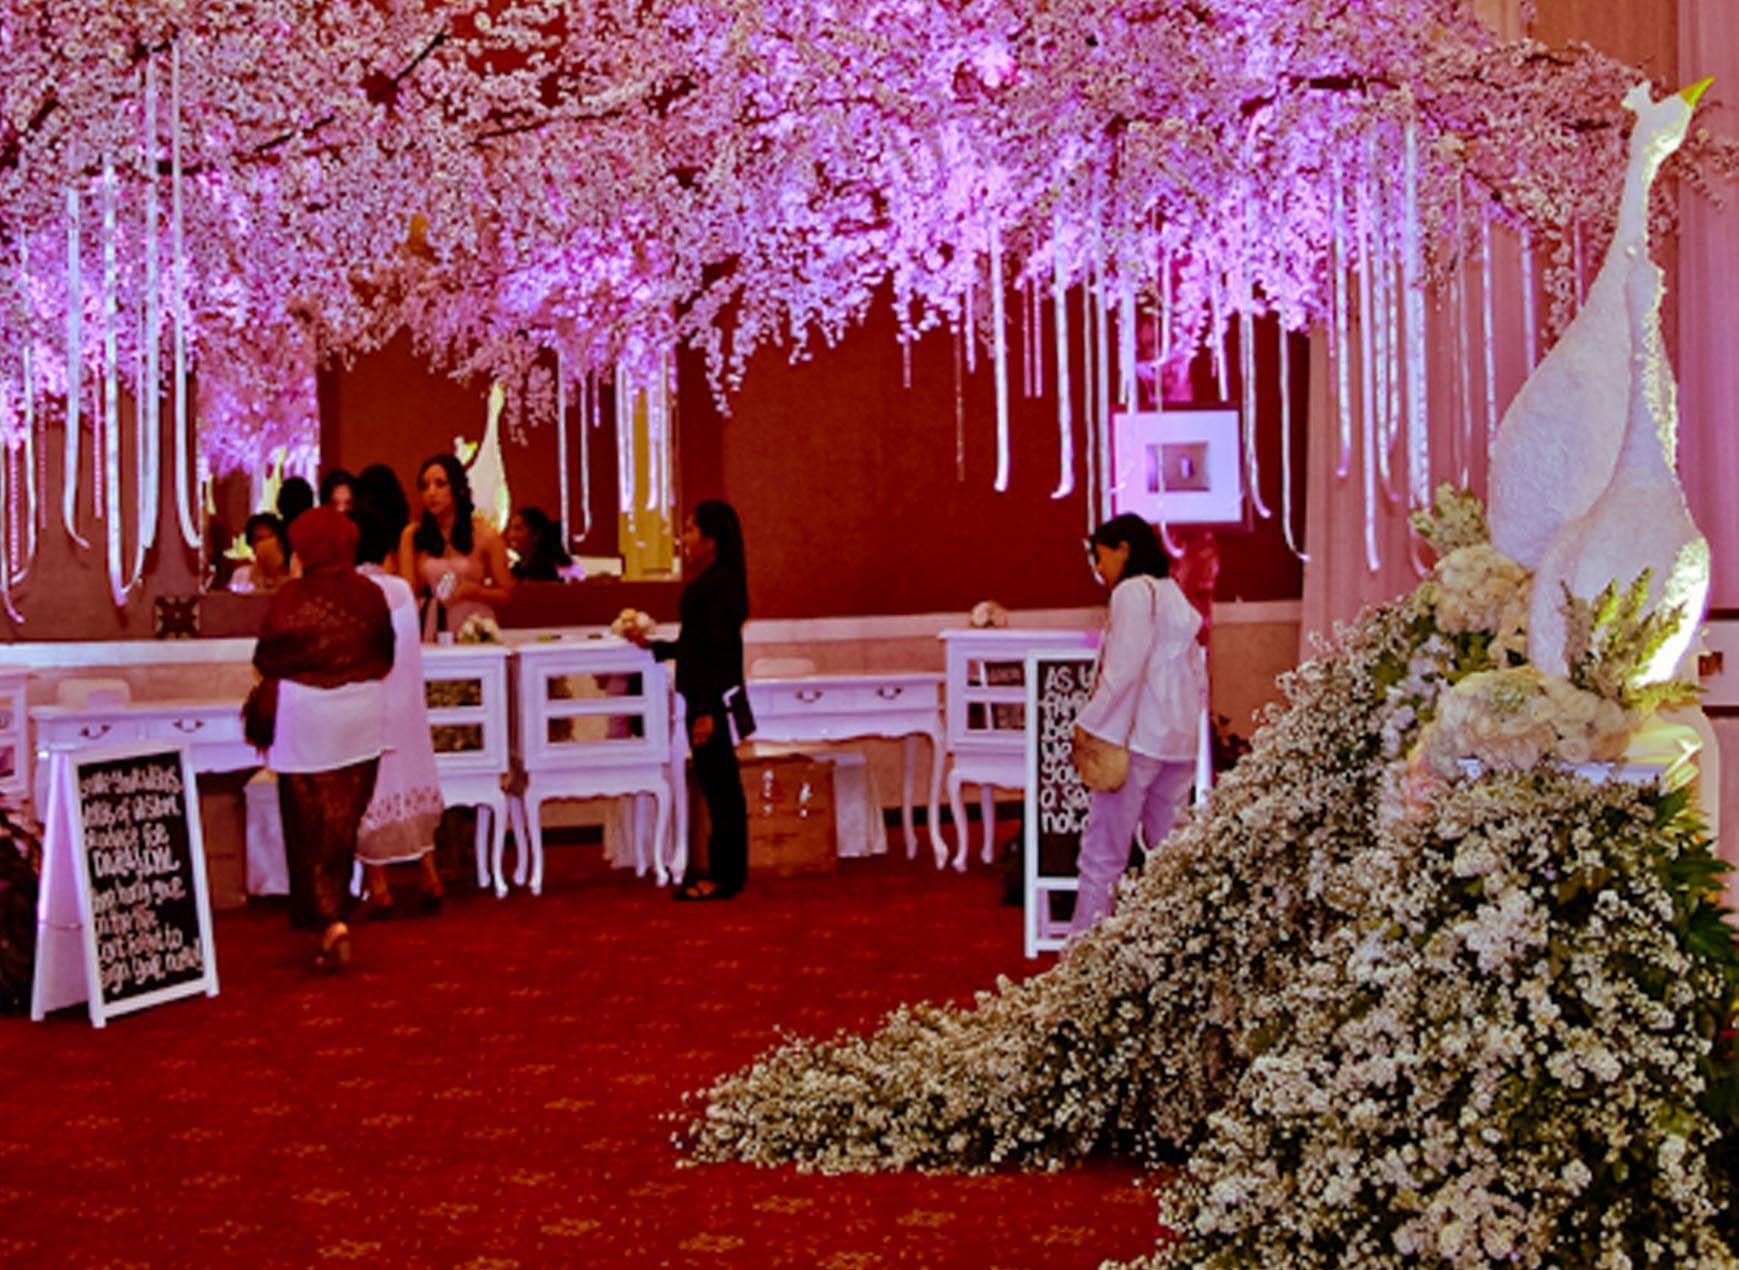 Romance fairytale mawarprada dekorasi pernikahan romantic romance fairytale mawarprada dekorasi pernikahan romantic wedding decoration jakarta junglespirit Images